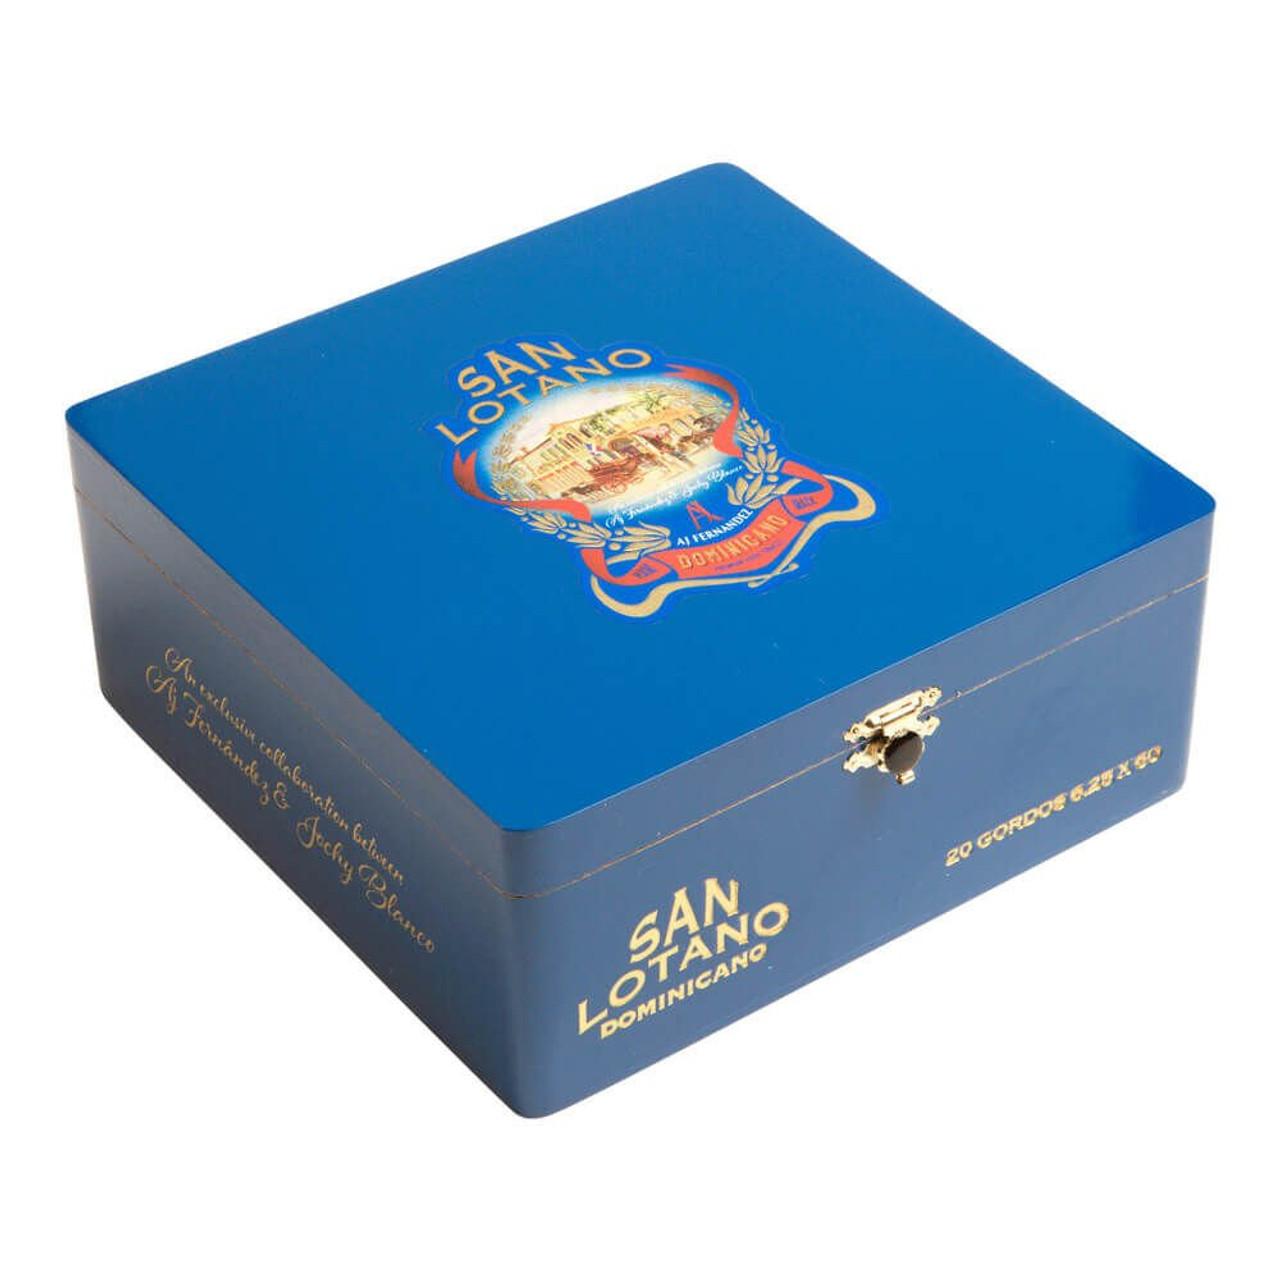 AJ Fernandez San Lotano Dominicano Toro Cigars - 6.0 x 50 (Box of 20)